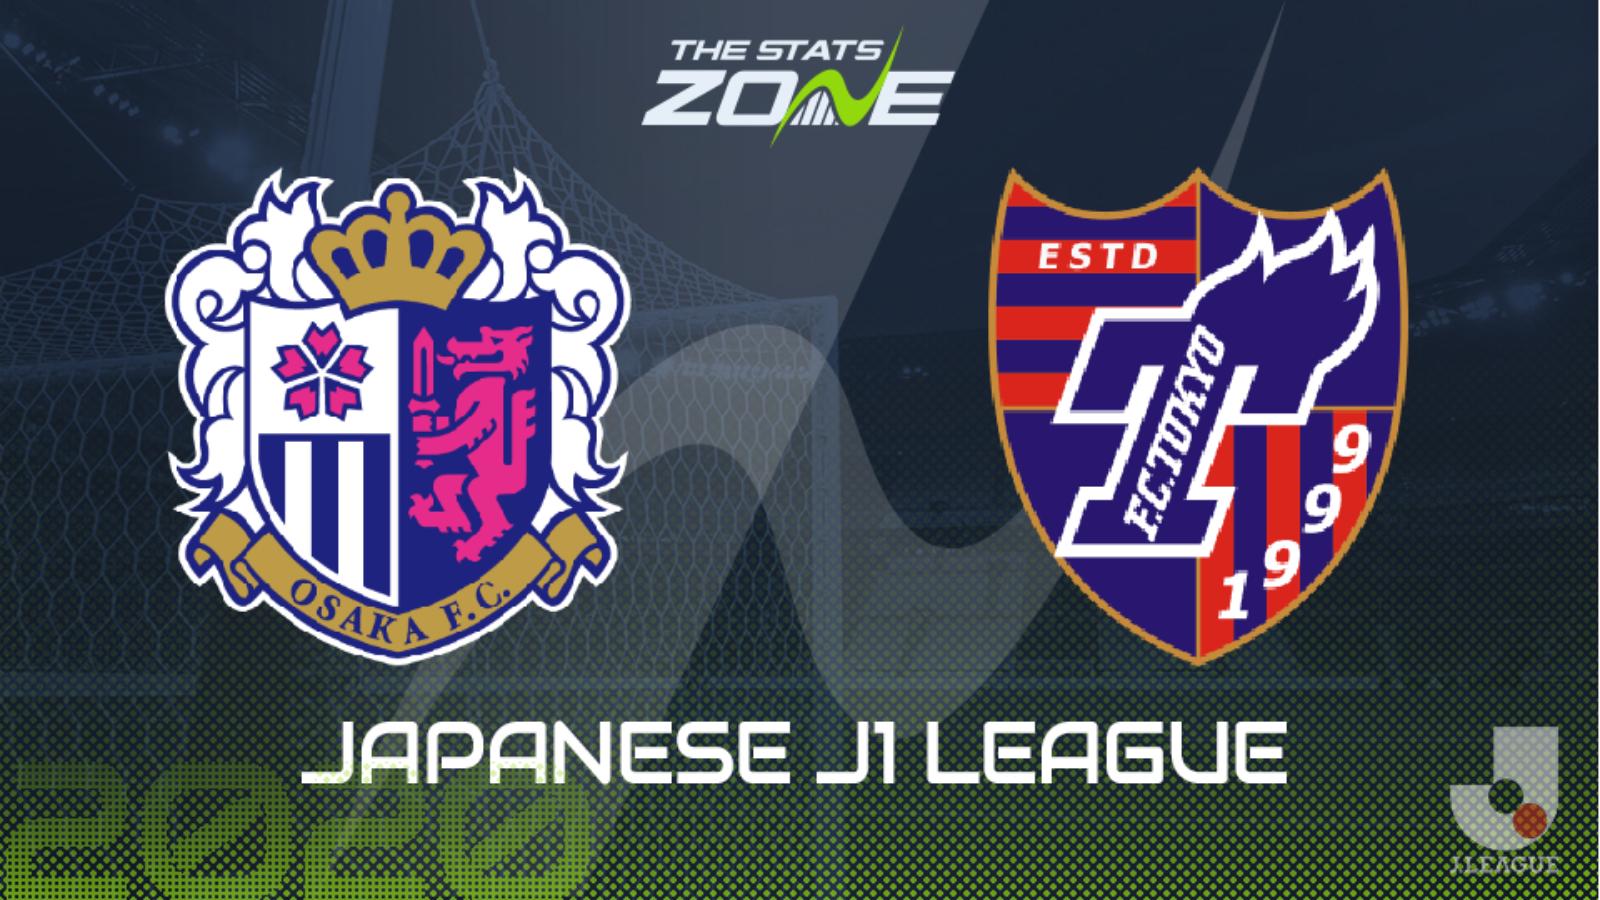 2020 Japanese J1 League Cerezo Osaka Vs Fc Tokyo Preview Prediction The Stats Zone